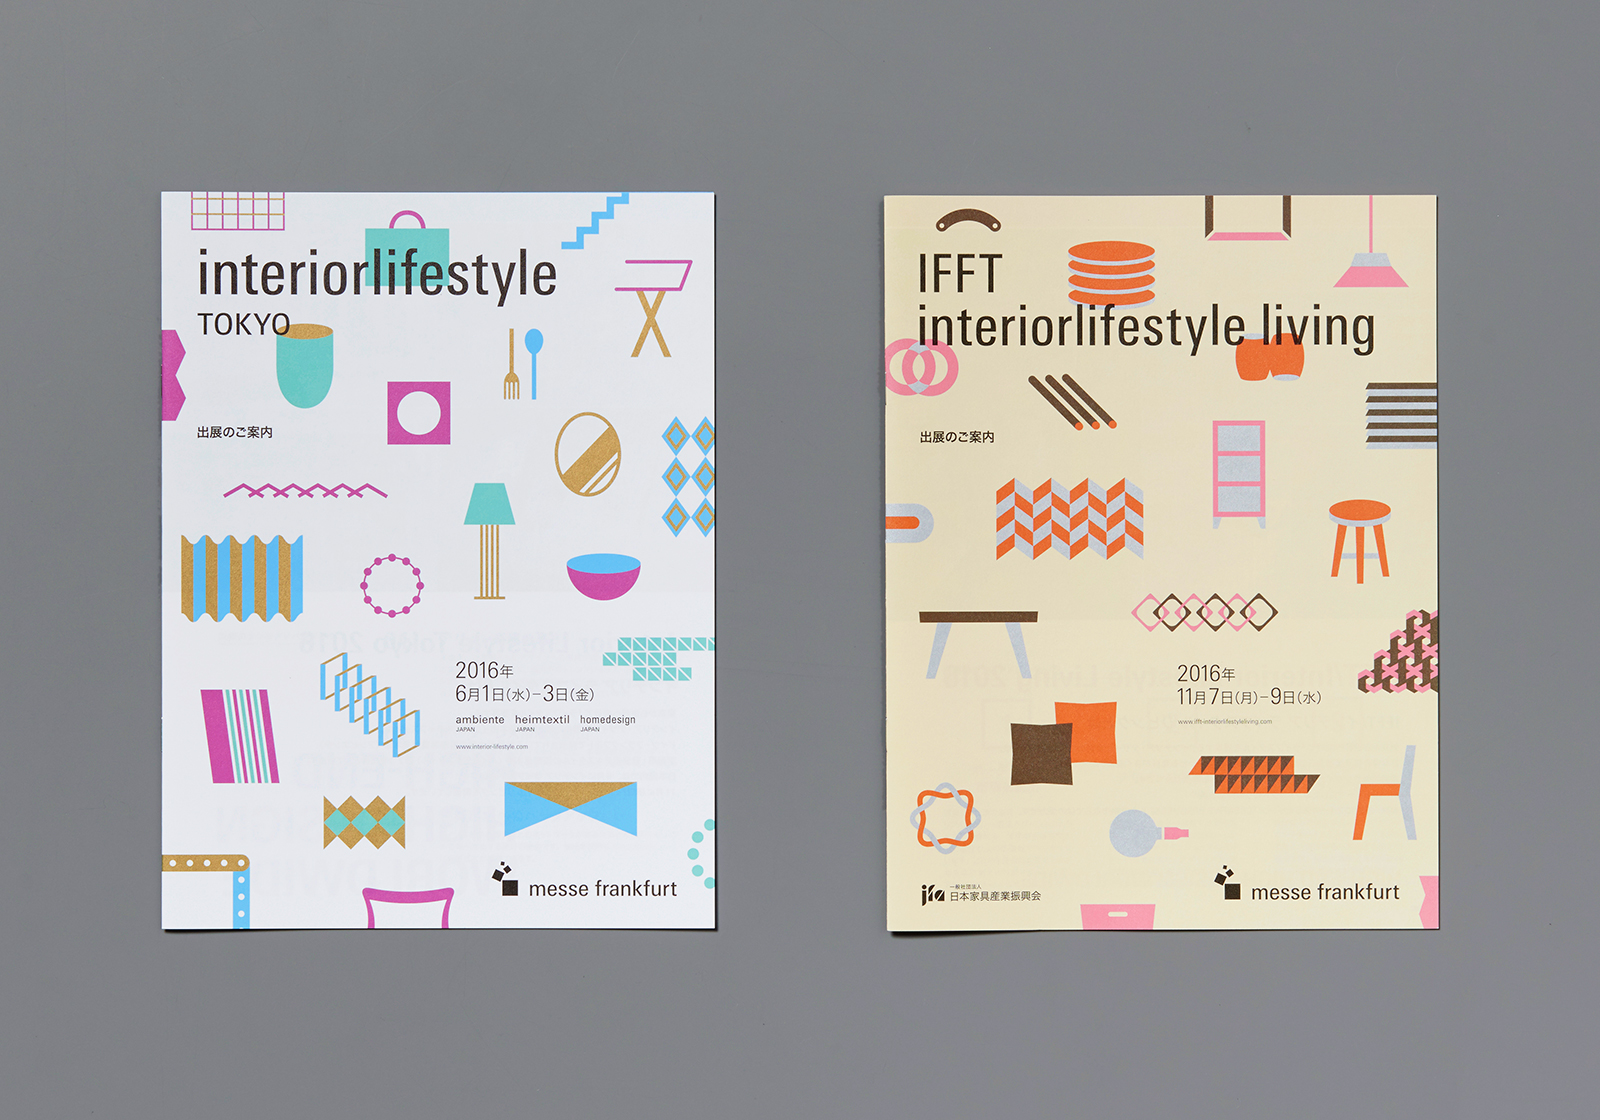 Interior Lifestyle Tokyo | IFFT/Interior Lifestyle Living 2016